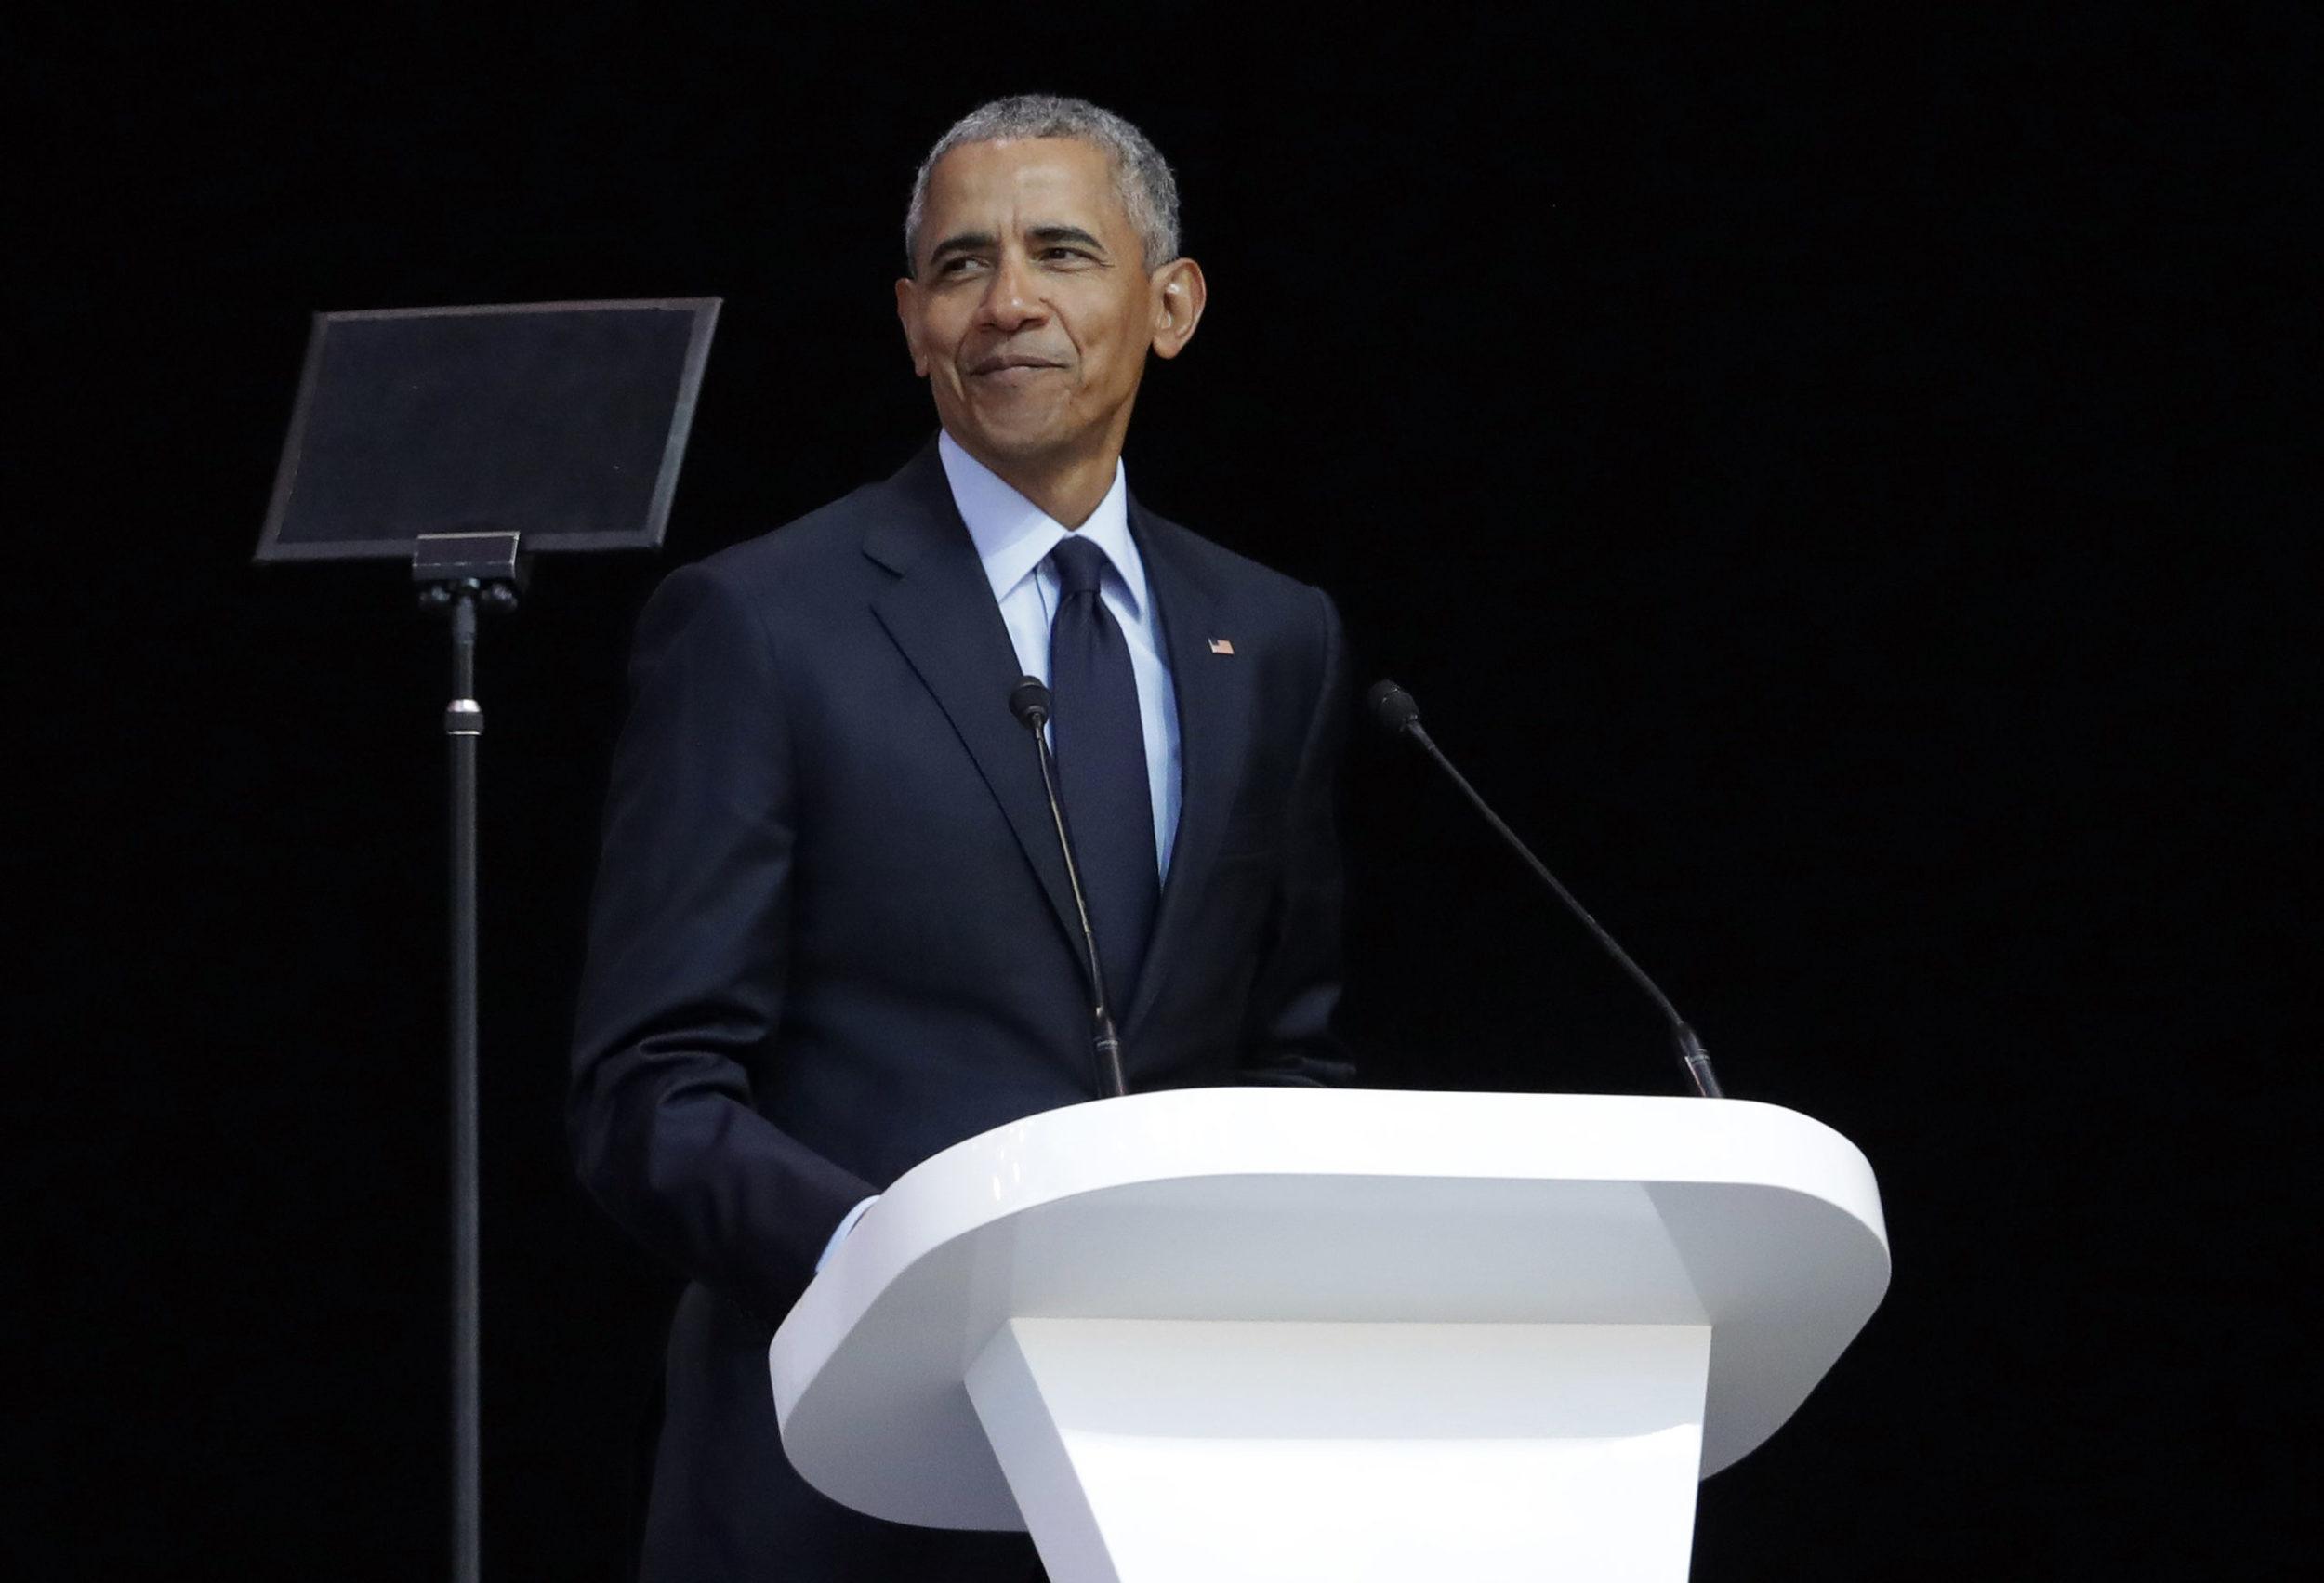 APTOPIX_South_Africa_Obama_Mandela_Speech622575540731